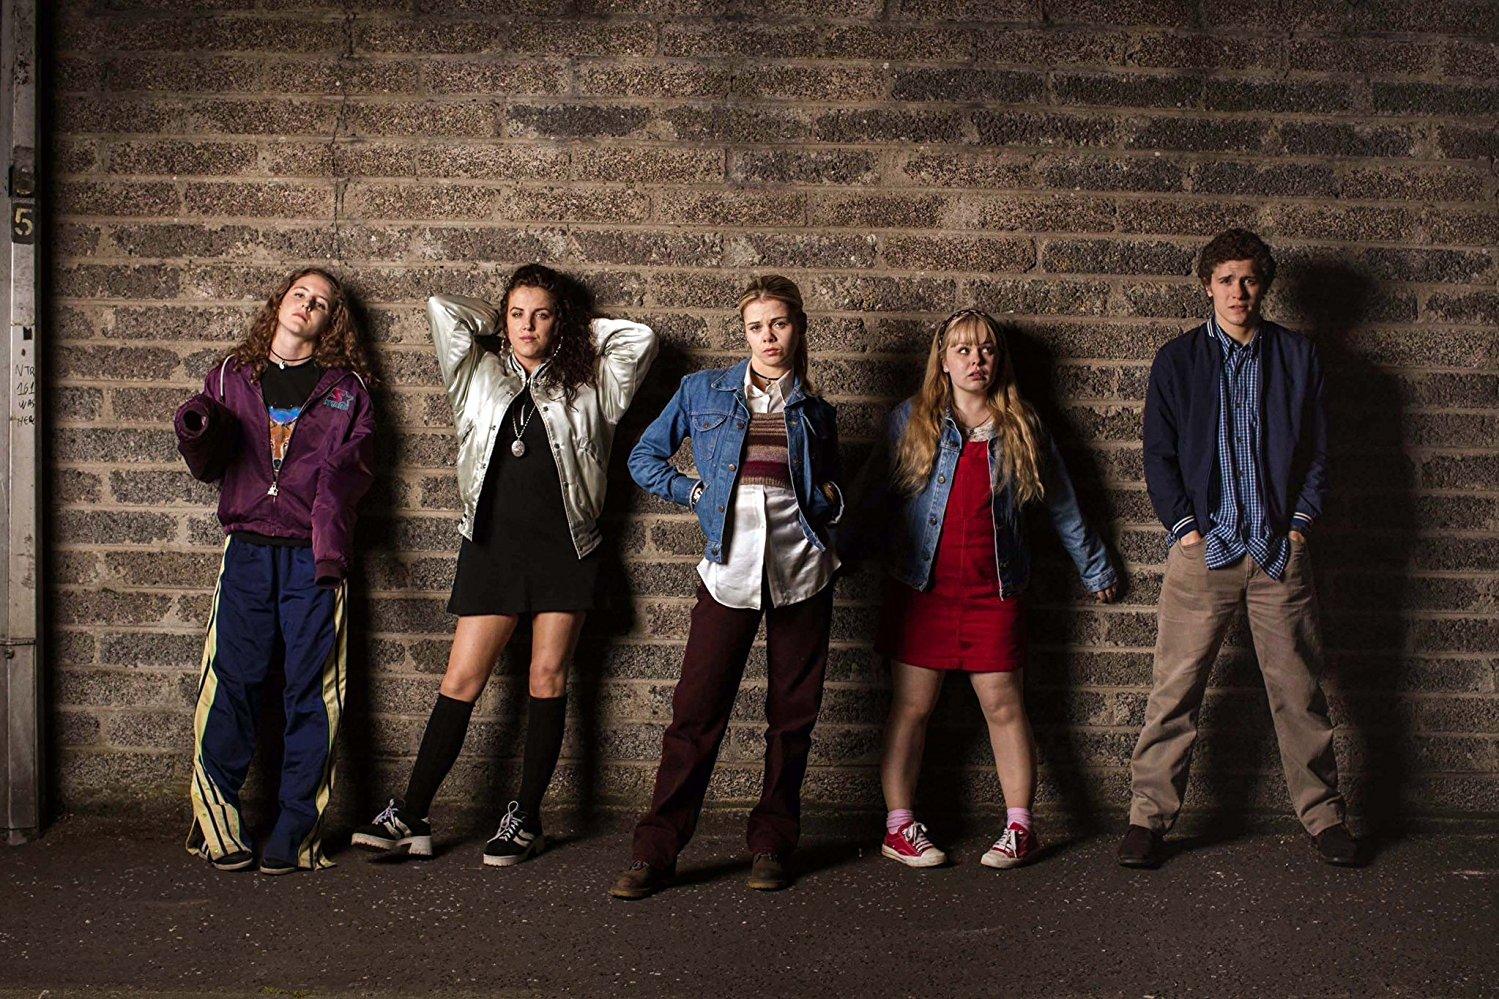 Derry Girls - Season 1